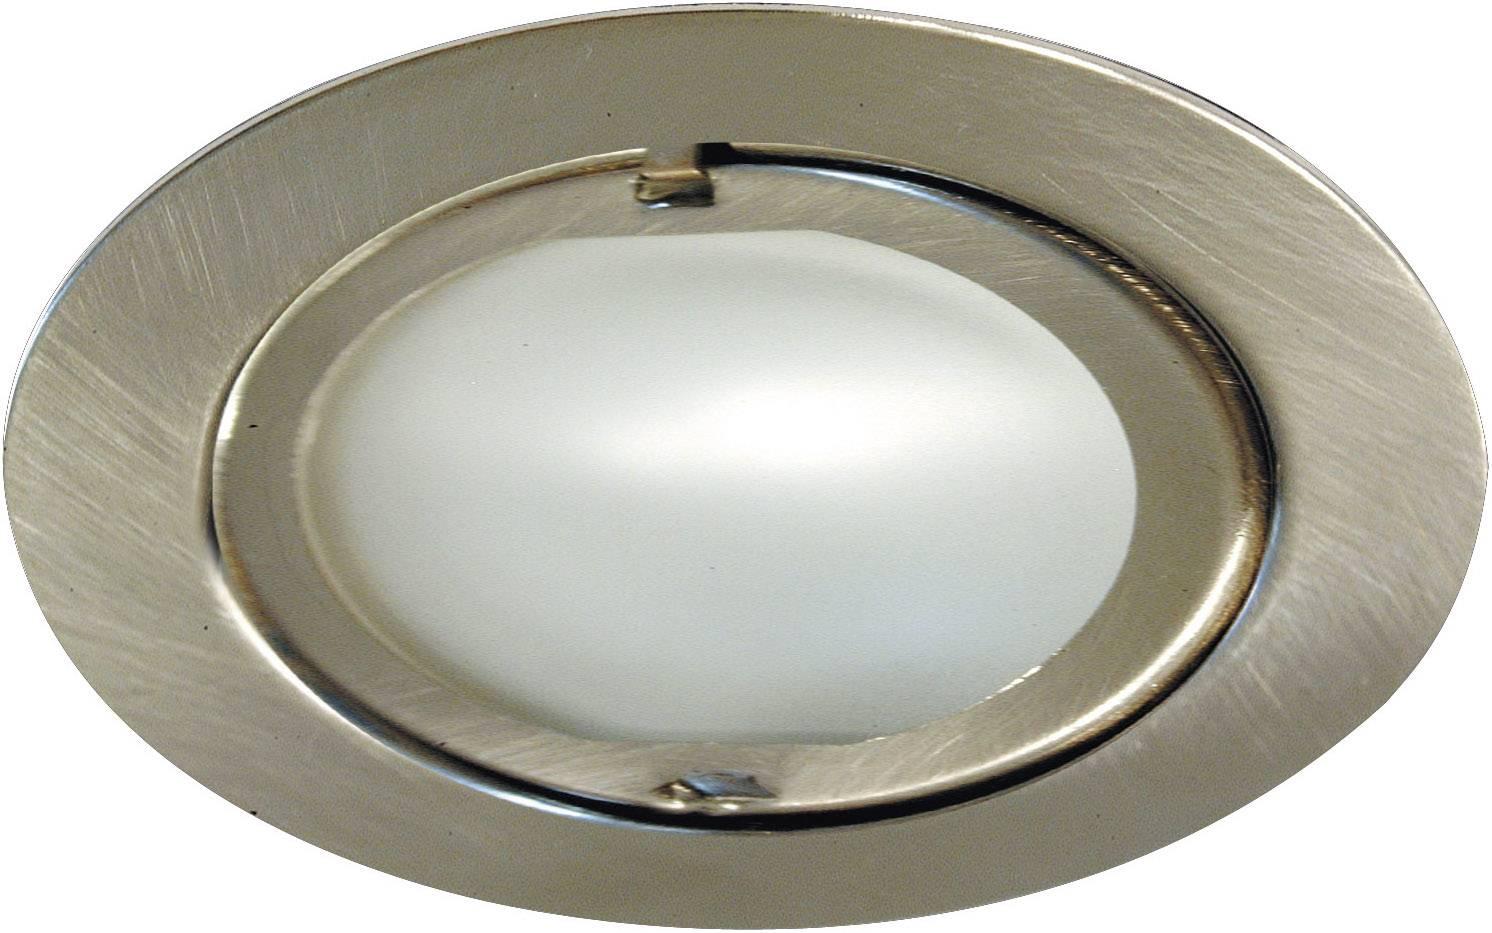 Nábytkové vstavané svietidlo Klip-Klap, leštený kov